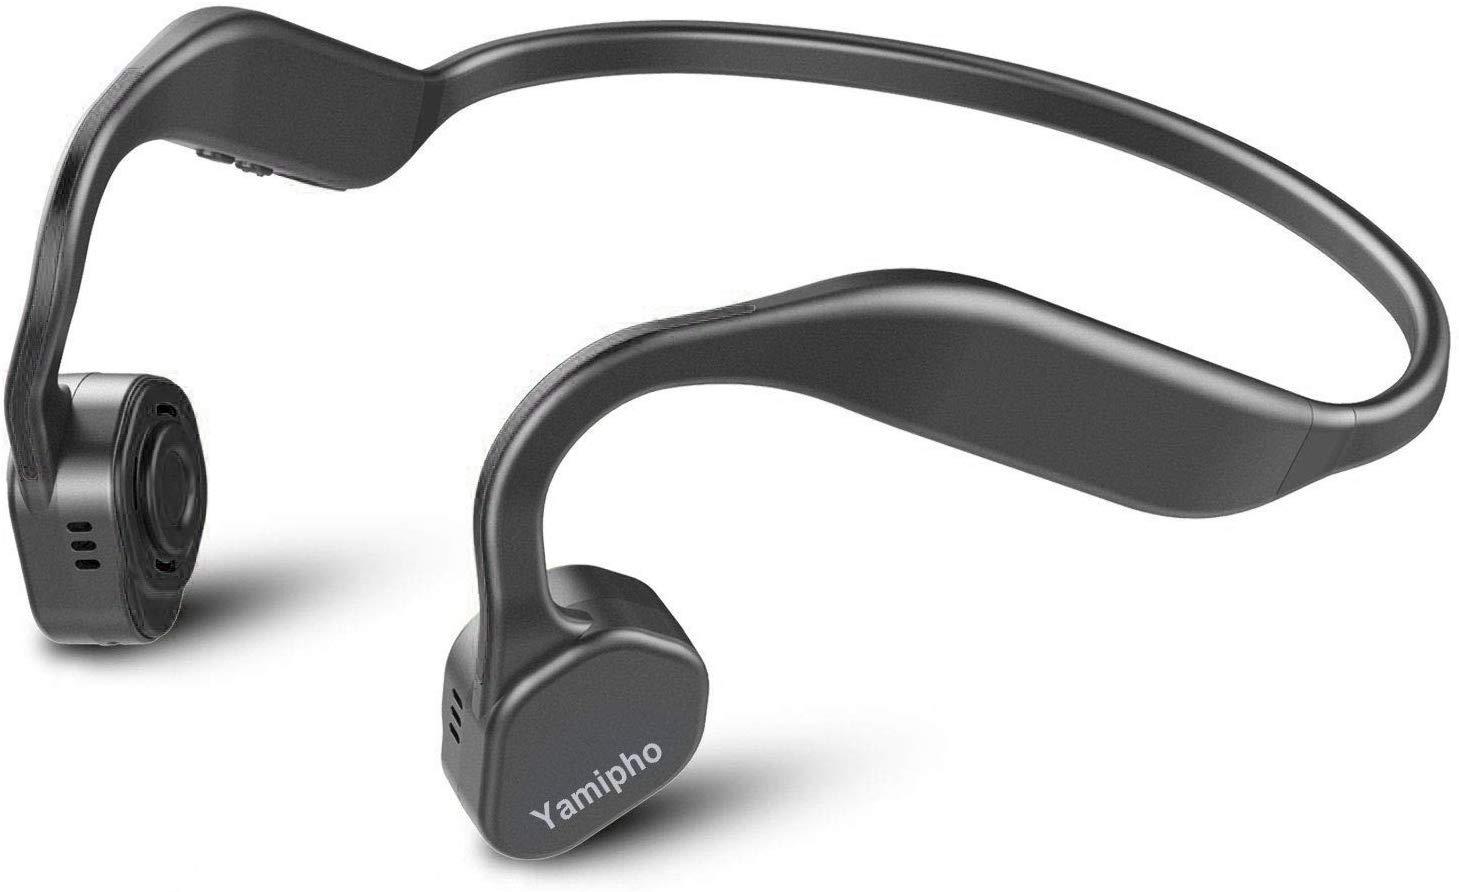 Yamipho Bone Conduction Headphones Bluetooth 5.0 Open-Ear Wireless Sports Headsets w Mic for Jogging Running Driving Cycling Fitness Yoga -Lightweight-1.2 oz Black